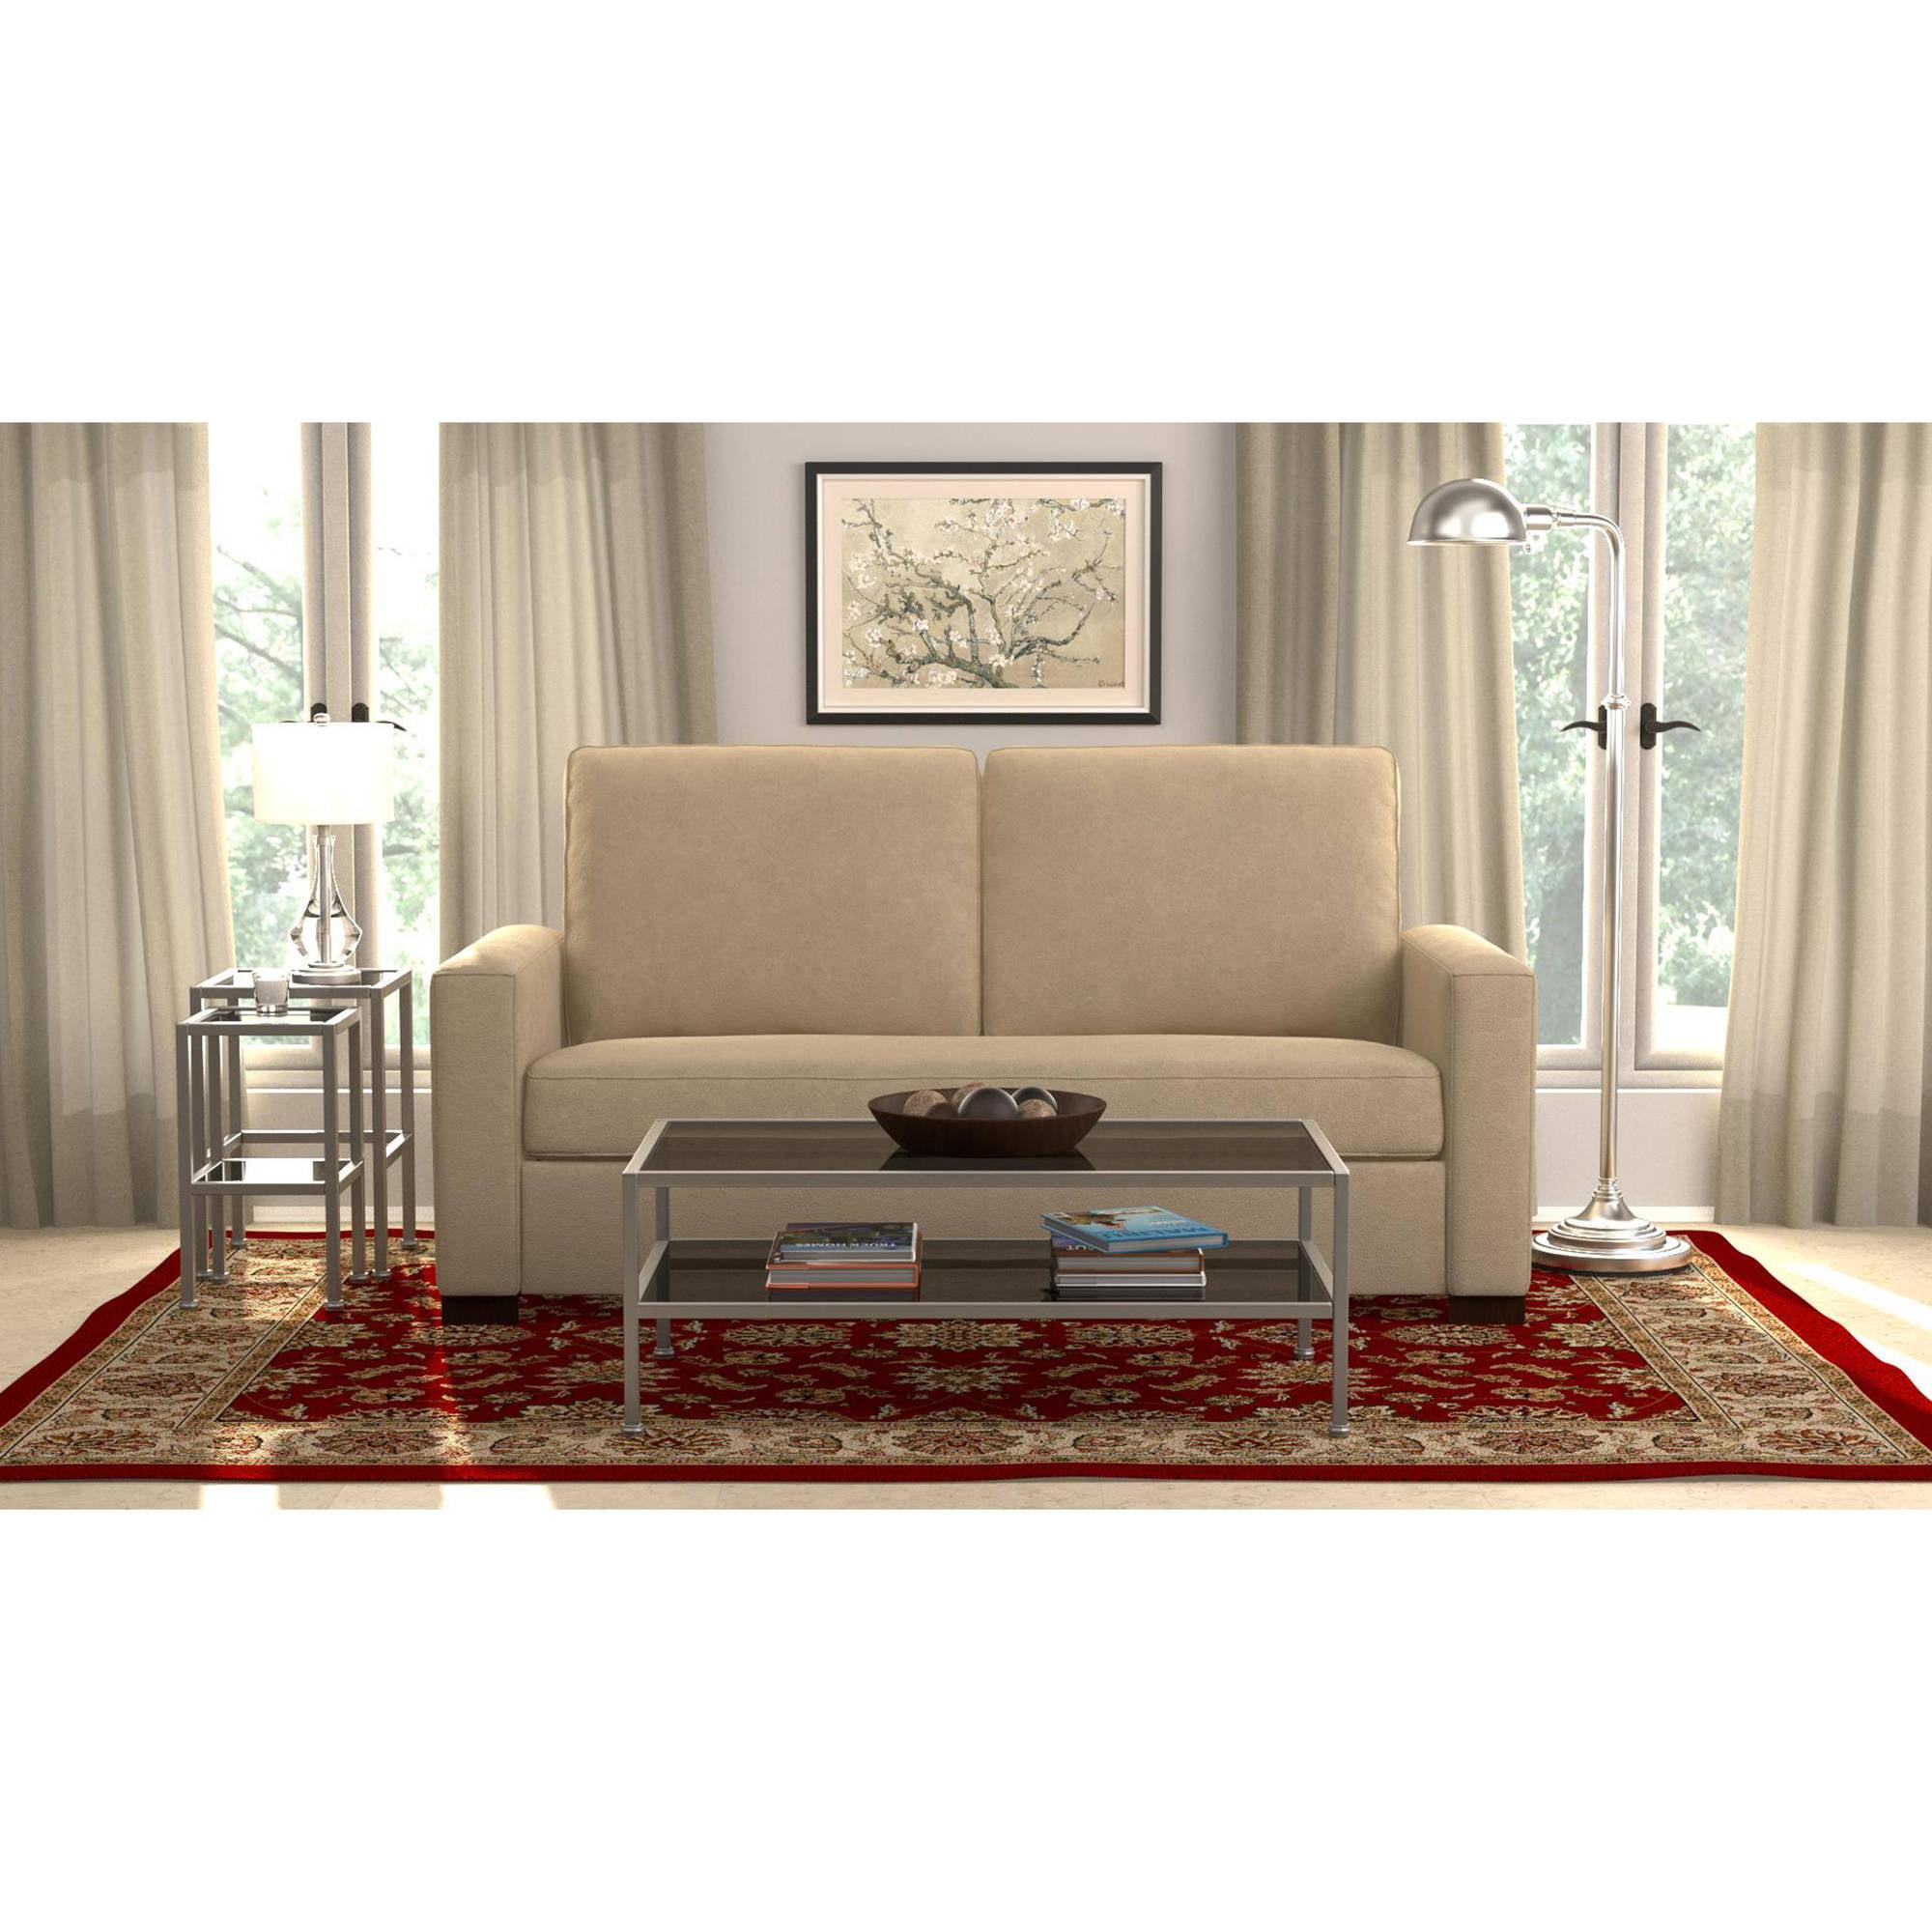 Millona SoFast Compact Microfiber Sofa, Multiple Colors